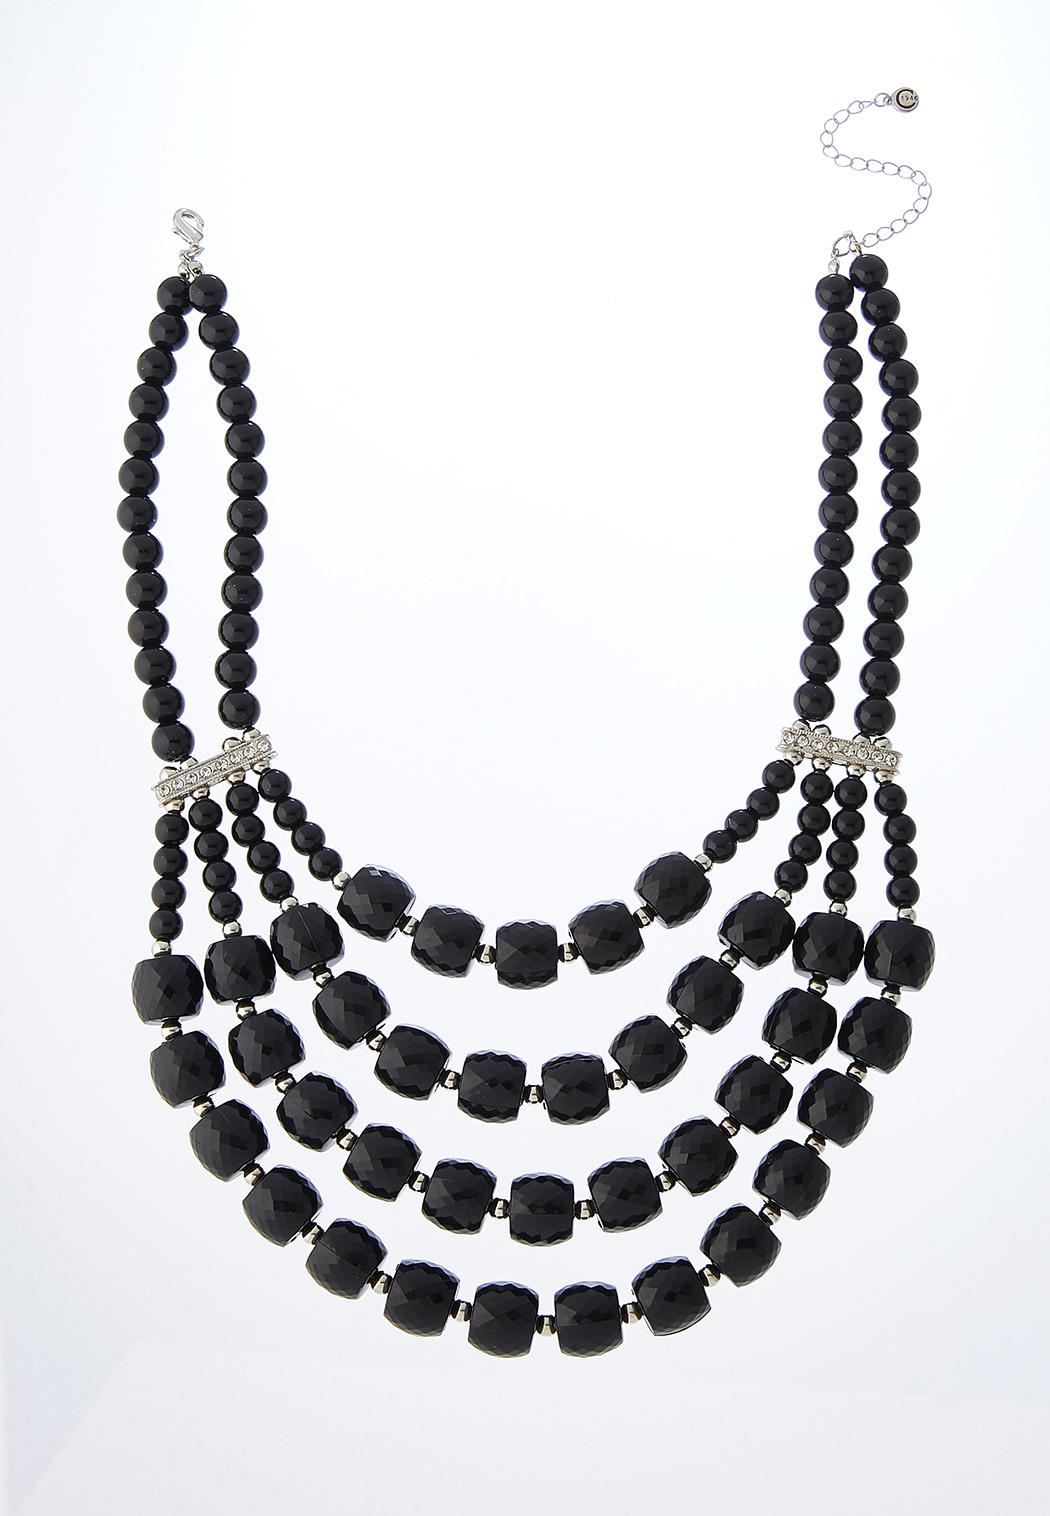 Midnight Acrylic Bib Necklace